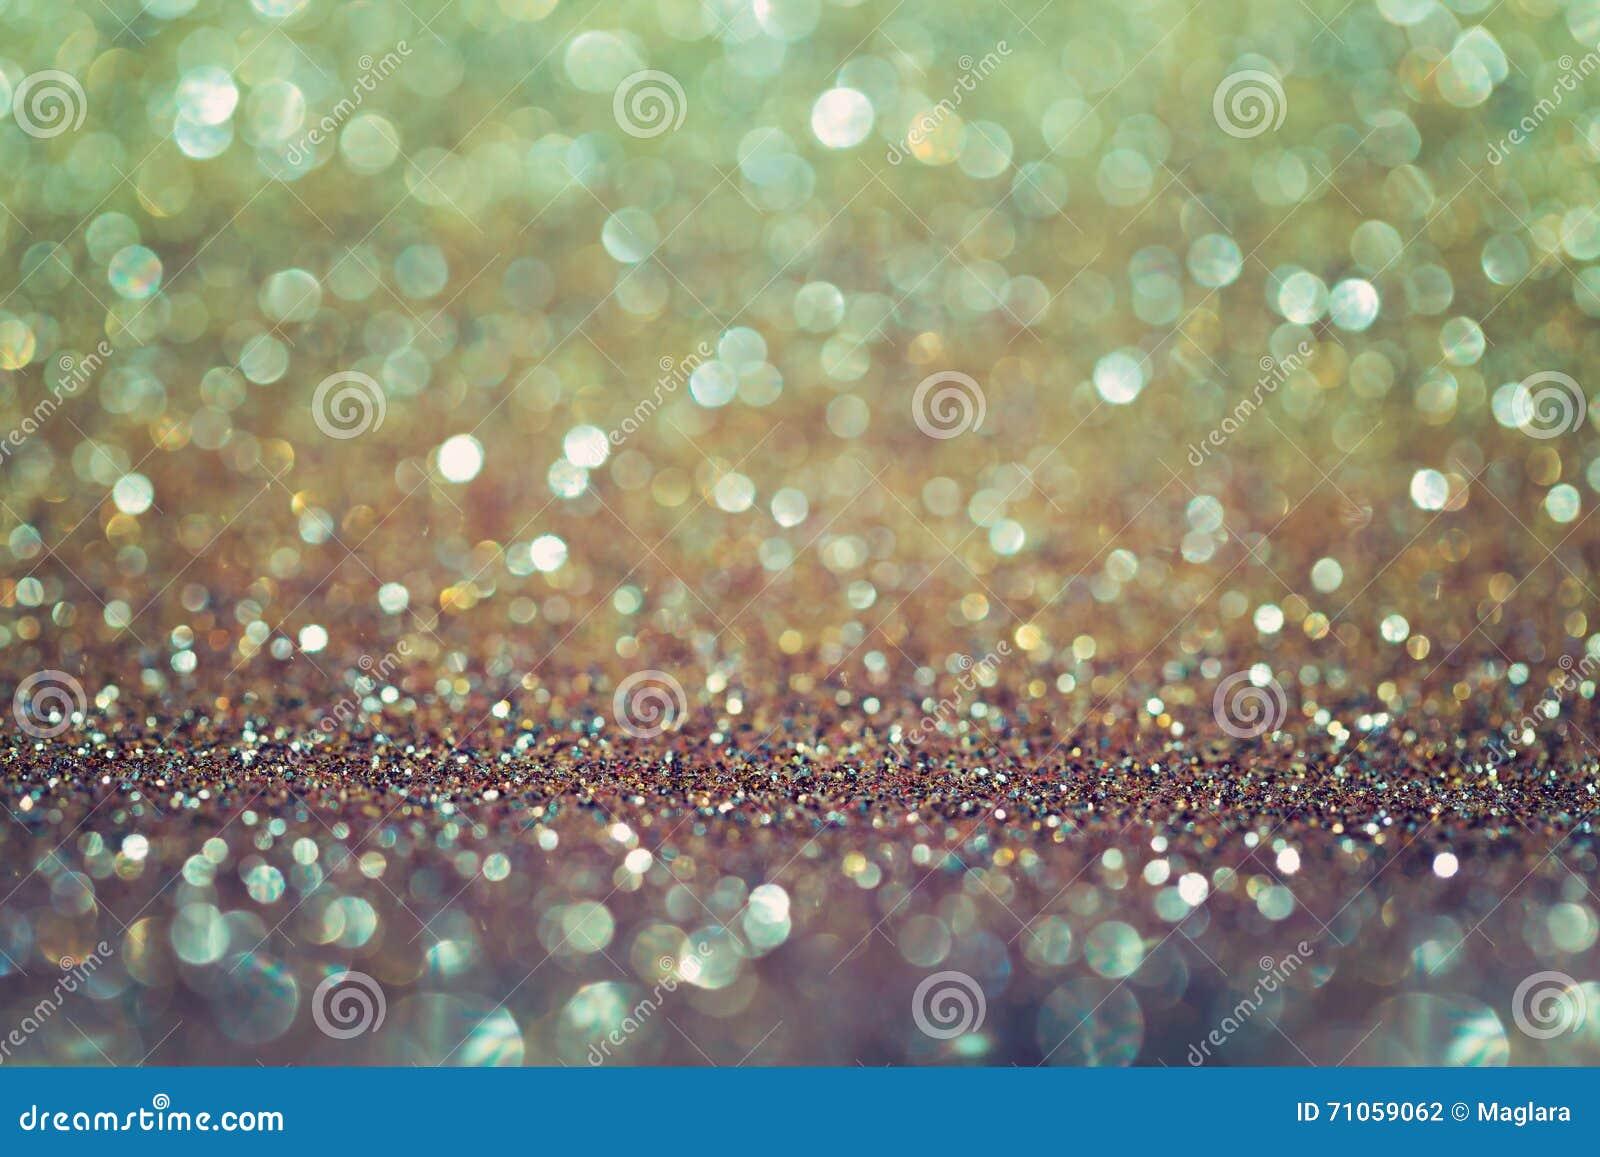 golden glitter bokeh background elegant and glamour background